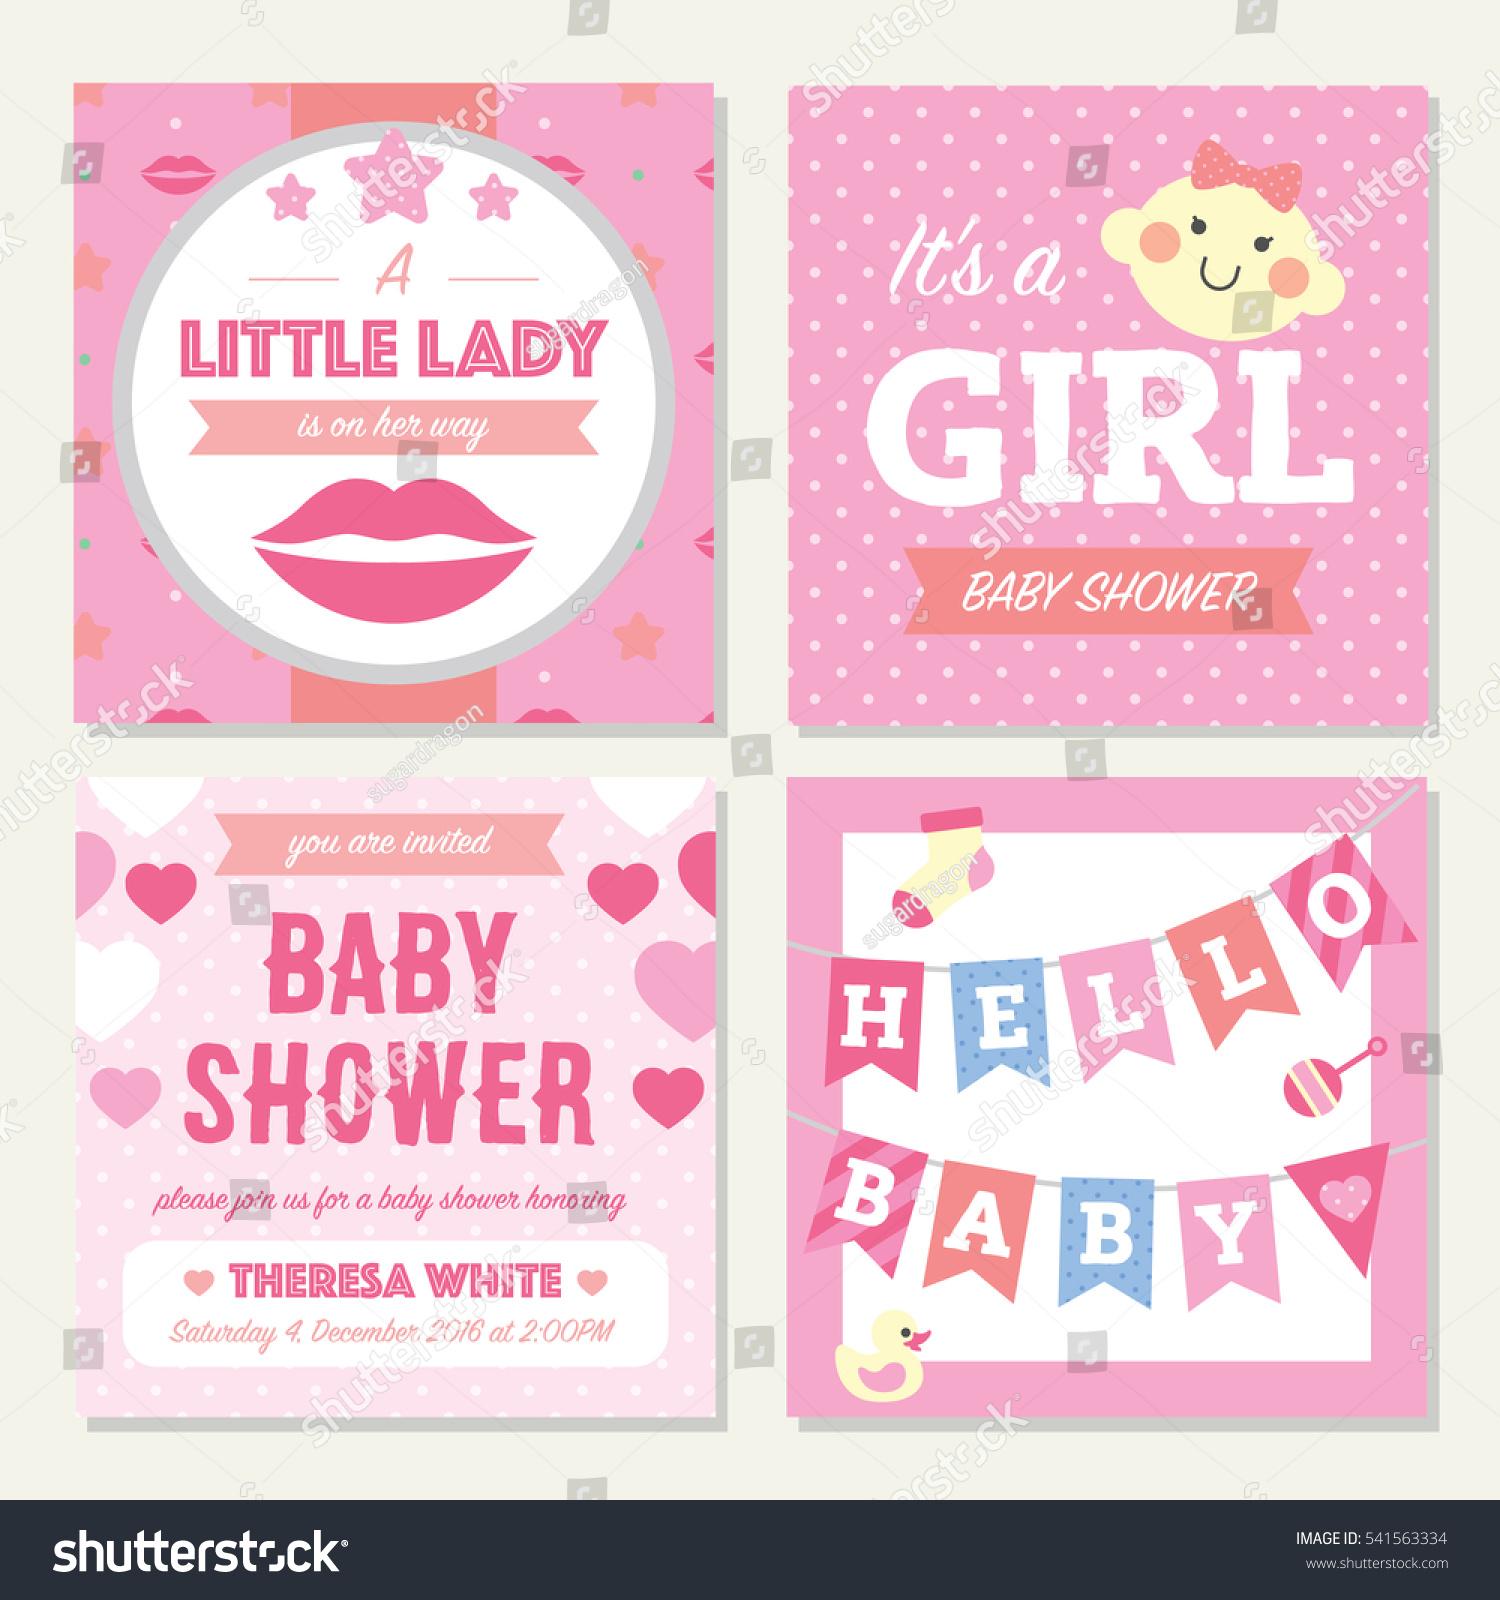 Baby Shower Girl Invitation Template Stock Vector (2018) 541563334 ...